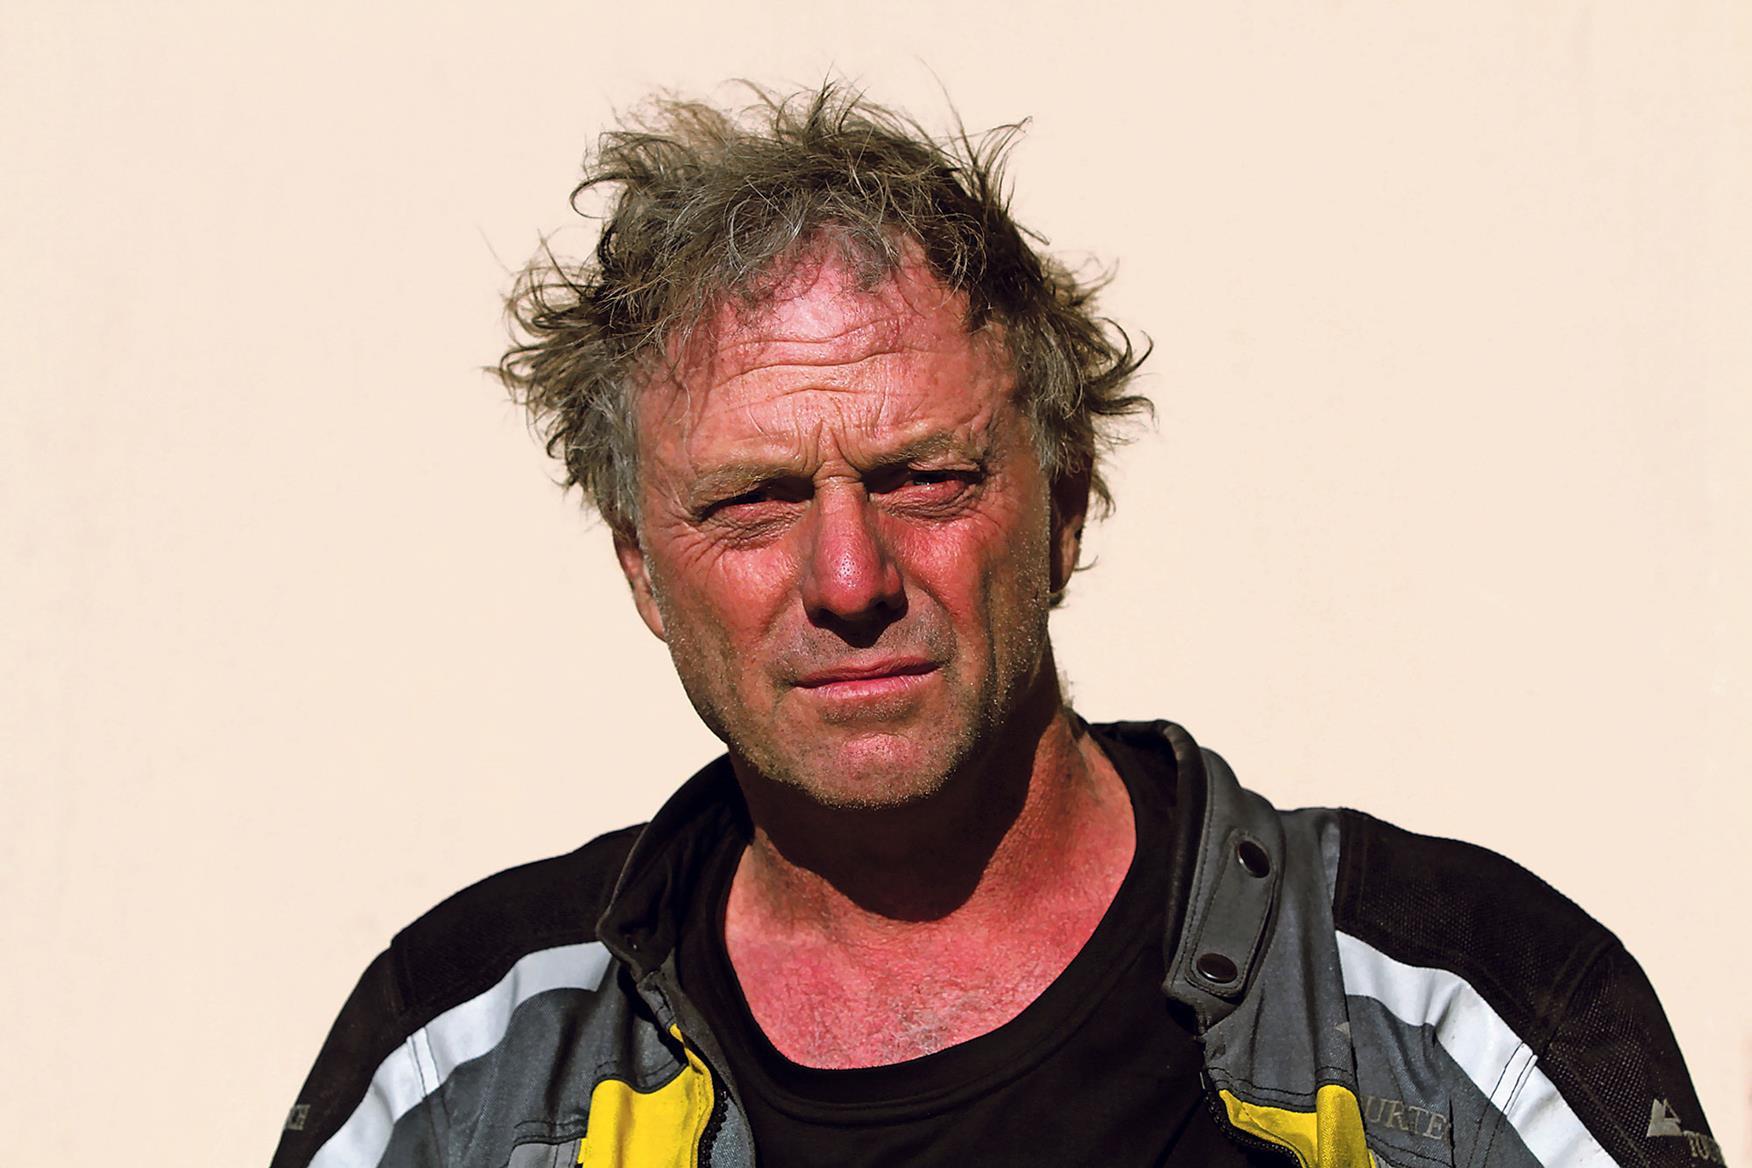 Nick Sanders circumnavigates the globe in 2005